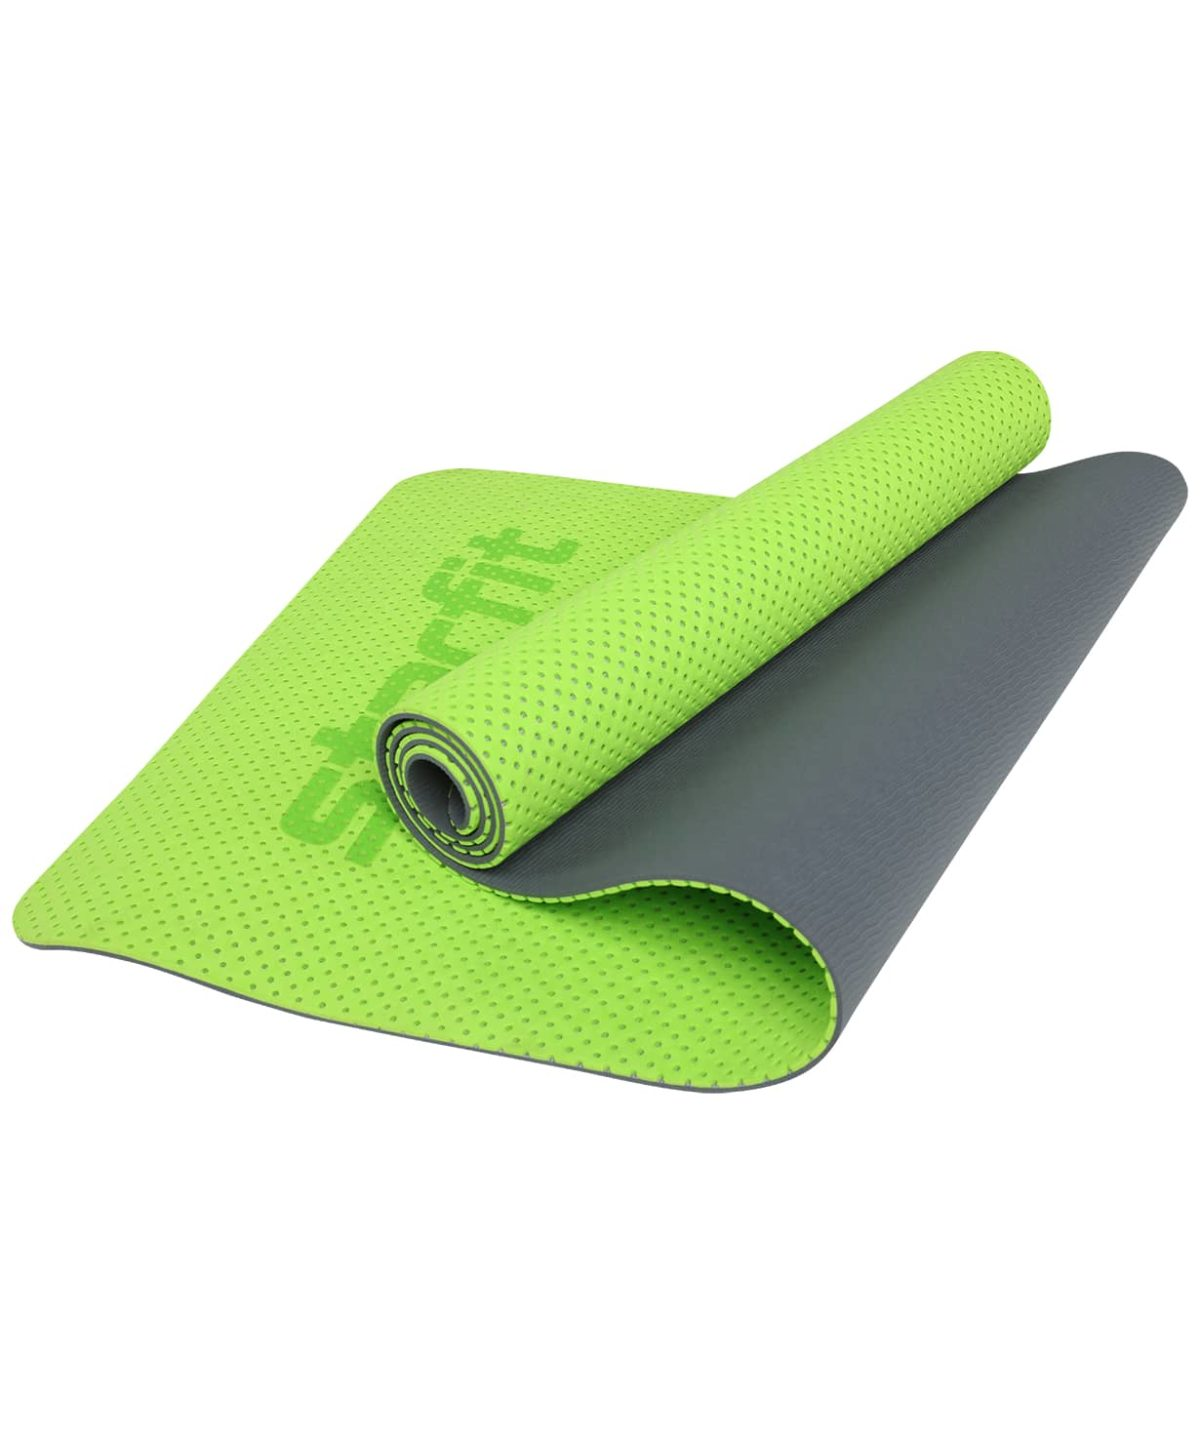 STARFIT Коврик для йоги, перфорированный FM-202 173х61х0,7 см: ярко-зеленый - 1